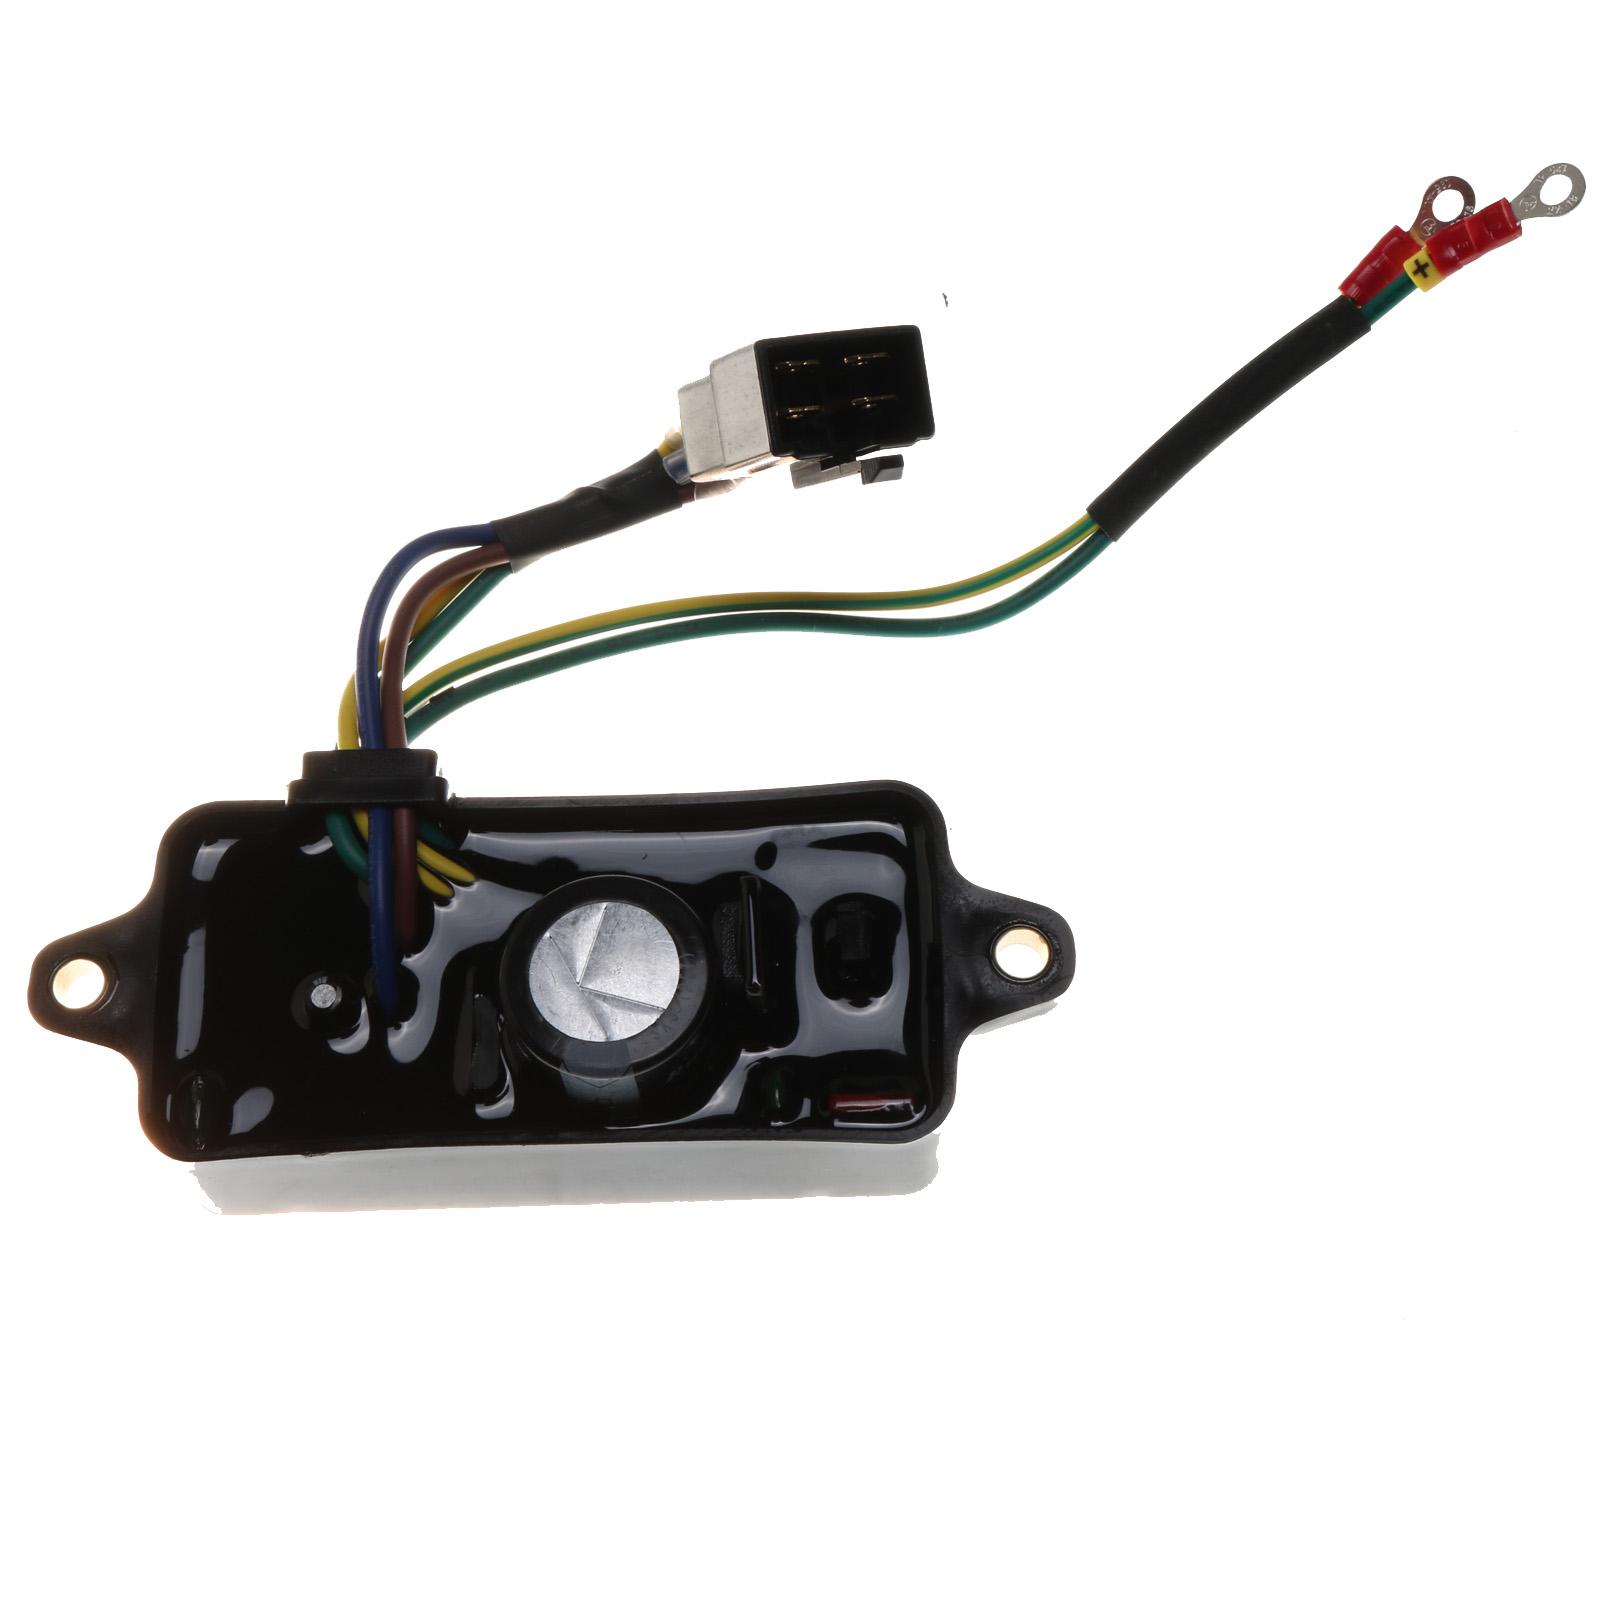 Solarhome Voltage Regulator 18961-02800KB 32350-898-003 for Honda EP-1800 EM2200 EC2500 EP-2500 EX800 Generator